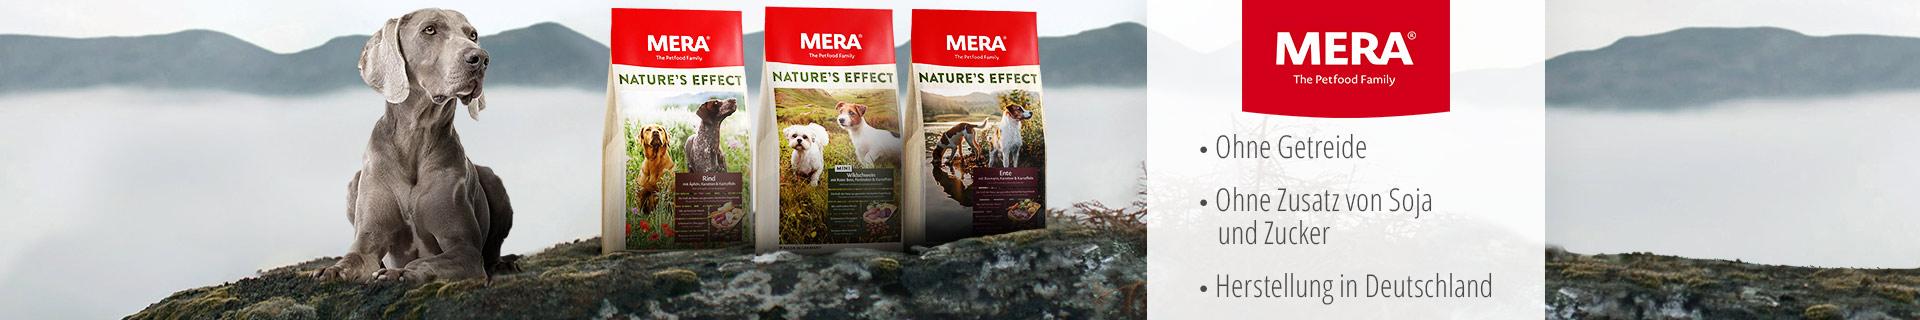 Mera Hund Trockenfutter Nature's Effect